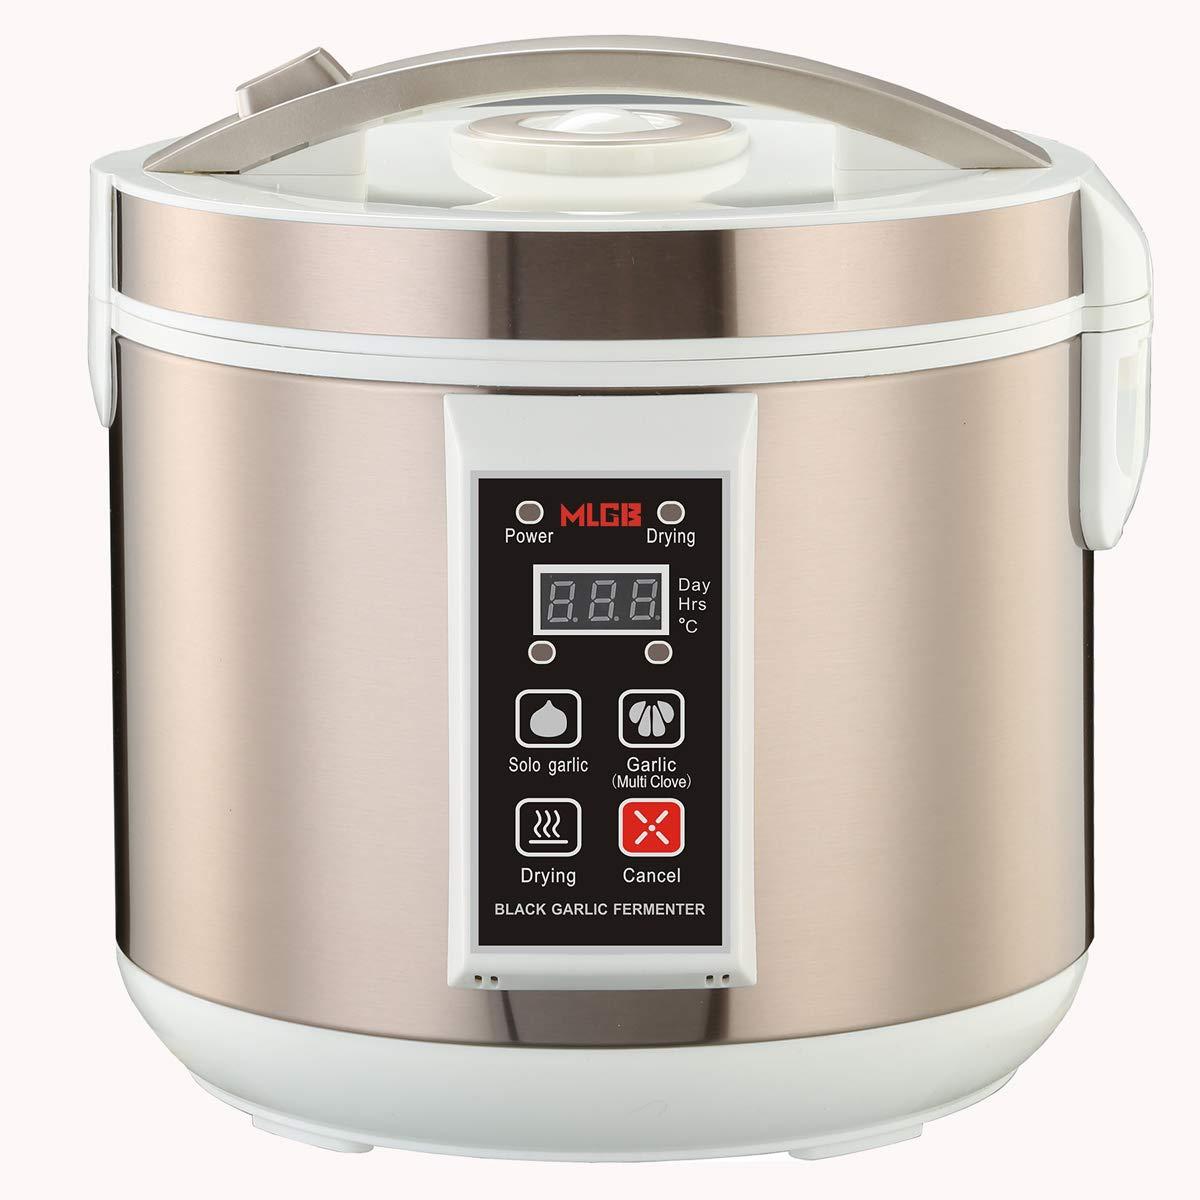 5L Black Garlic Fermenter Full Automatic Intelligent Control Garlics Maker Multi Clove Garlic DIY Cooker,120V - MLGB